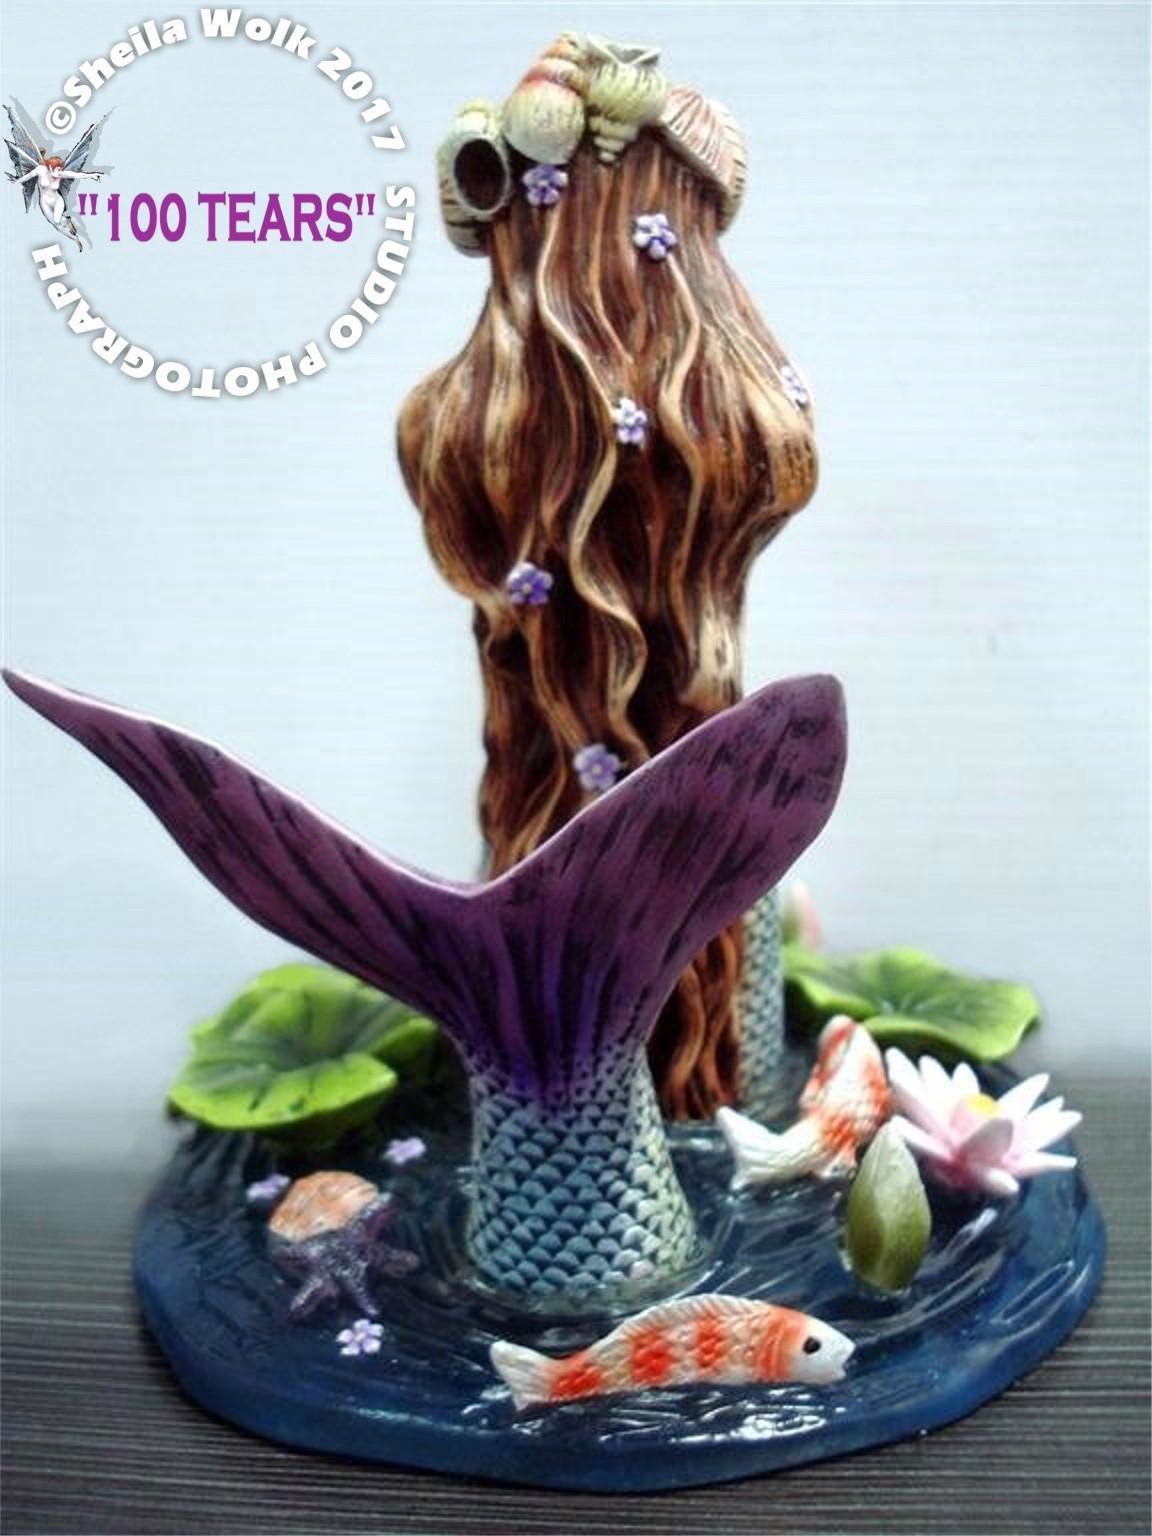 SHEILA WOLKS 100 TEARS Mermaid Figurine